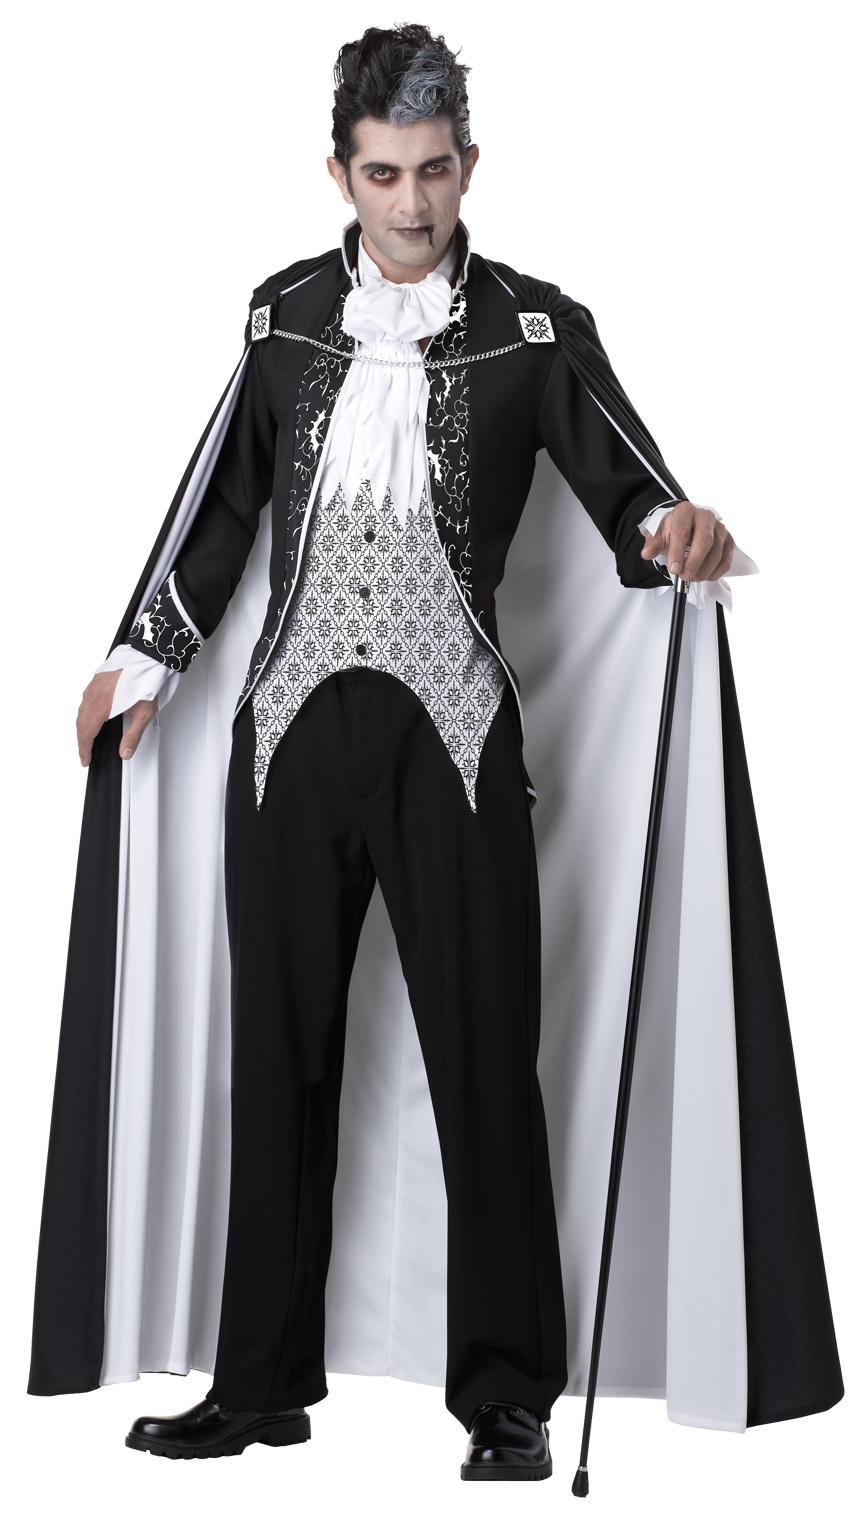 deluxe mens royal gothic vampire halloween fancy dress black white adult costume ebay. Black Bedroom Furniture Sets. Home Design Ideas